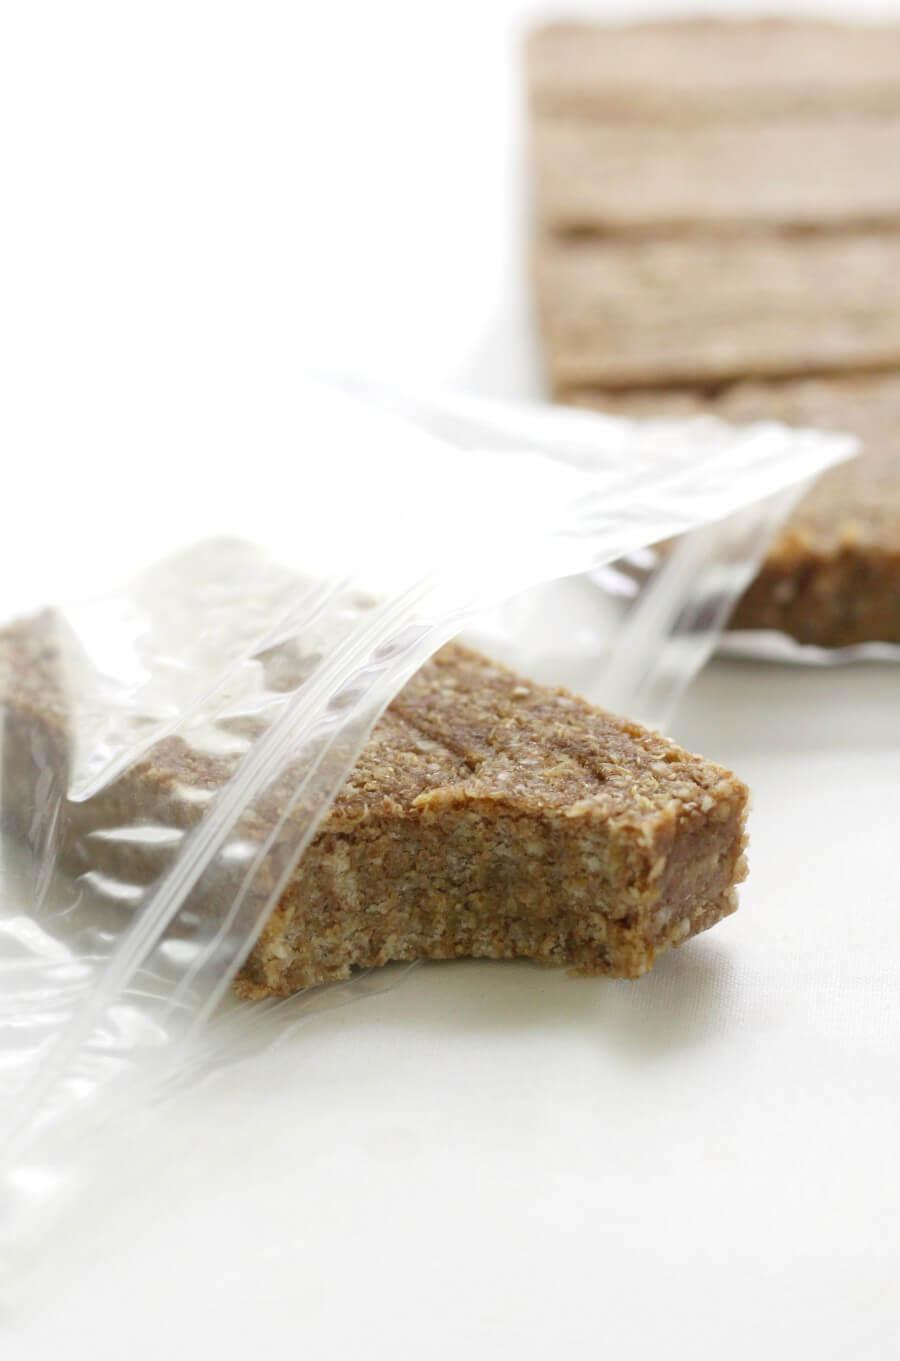 Oat-Free No-Bake Granola Bars